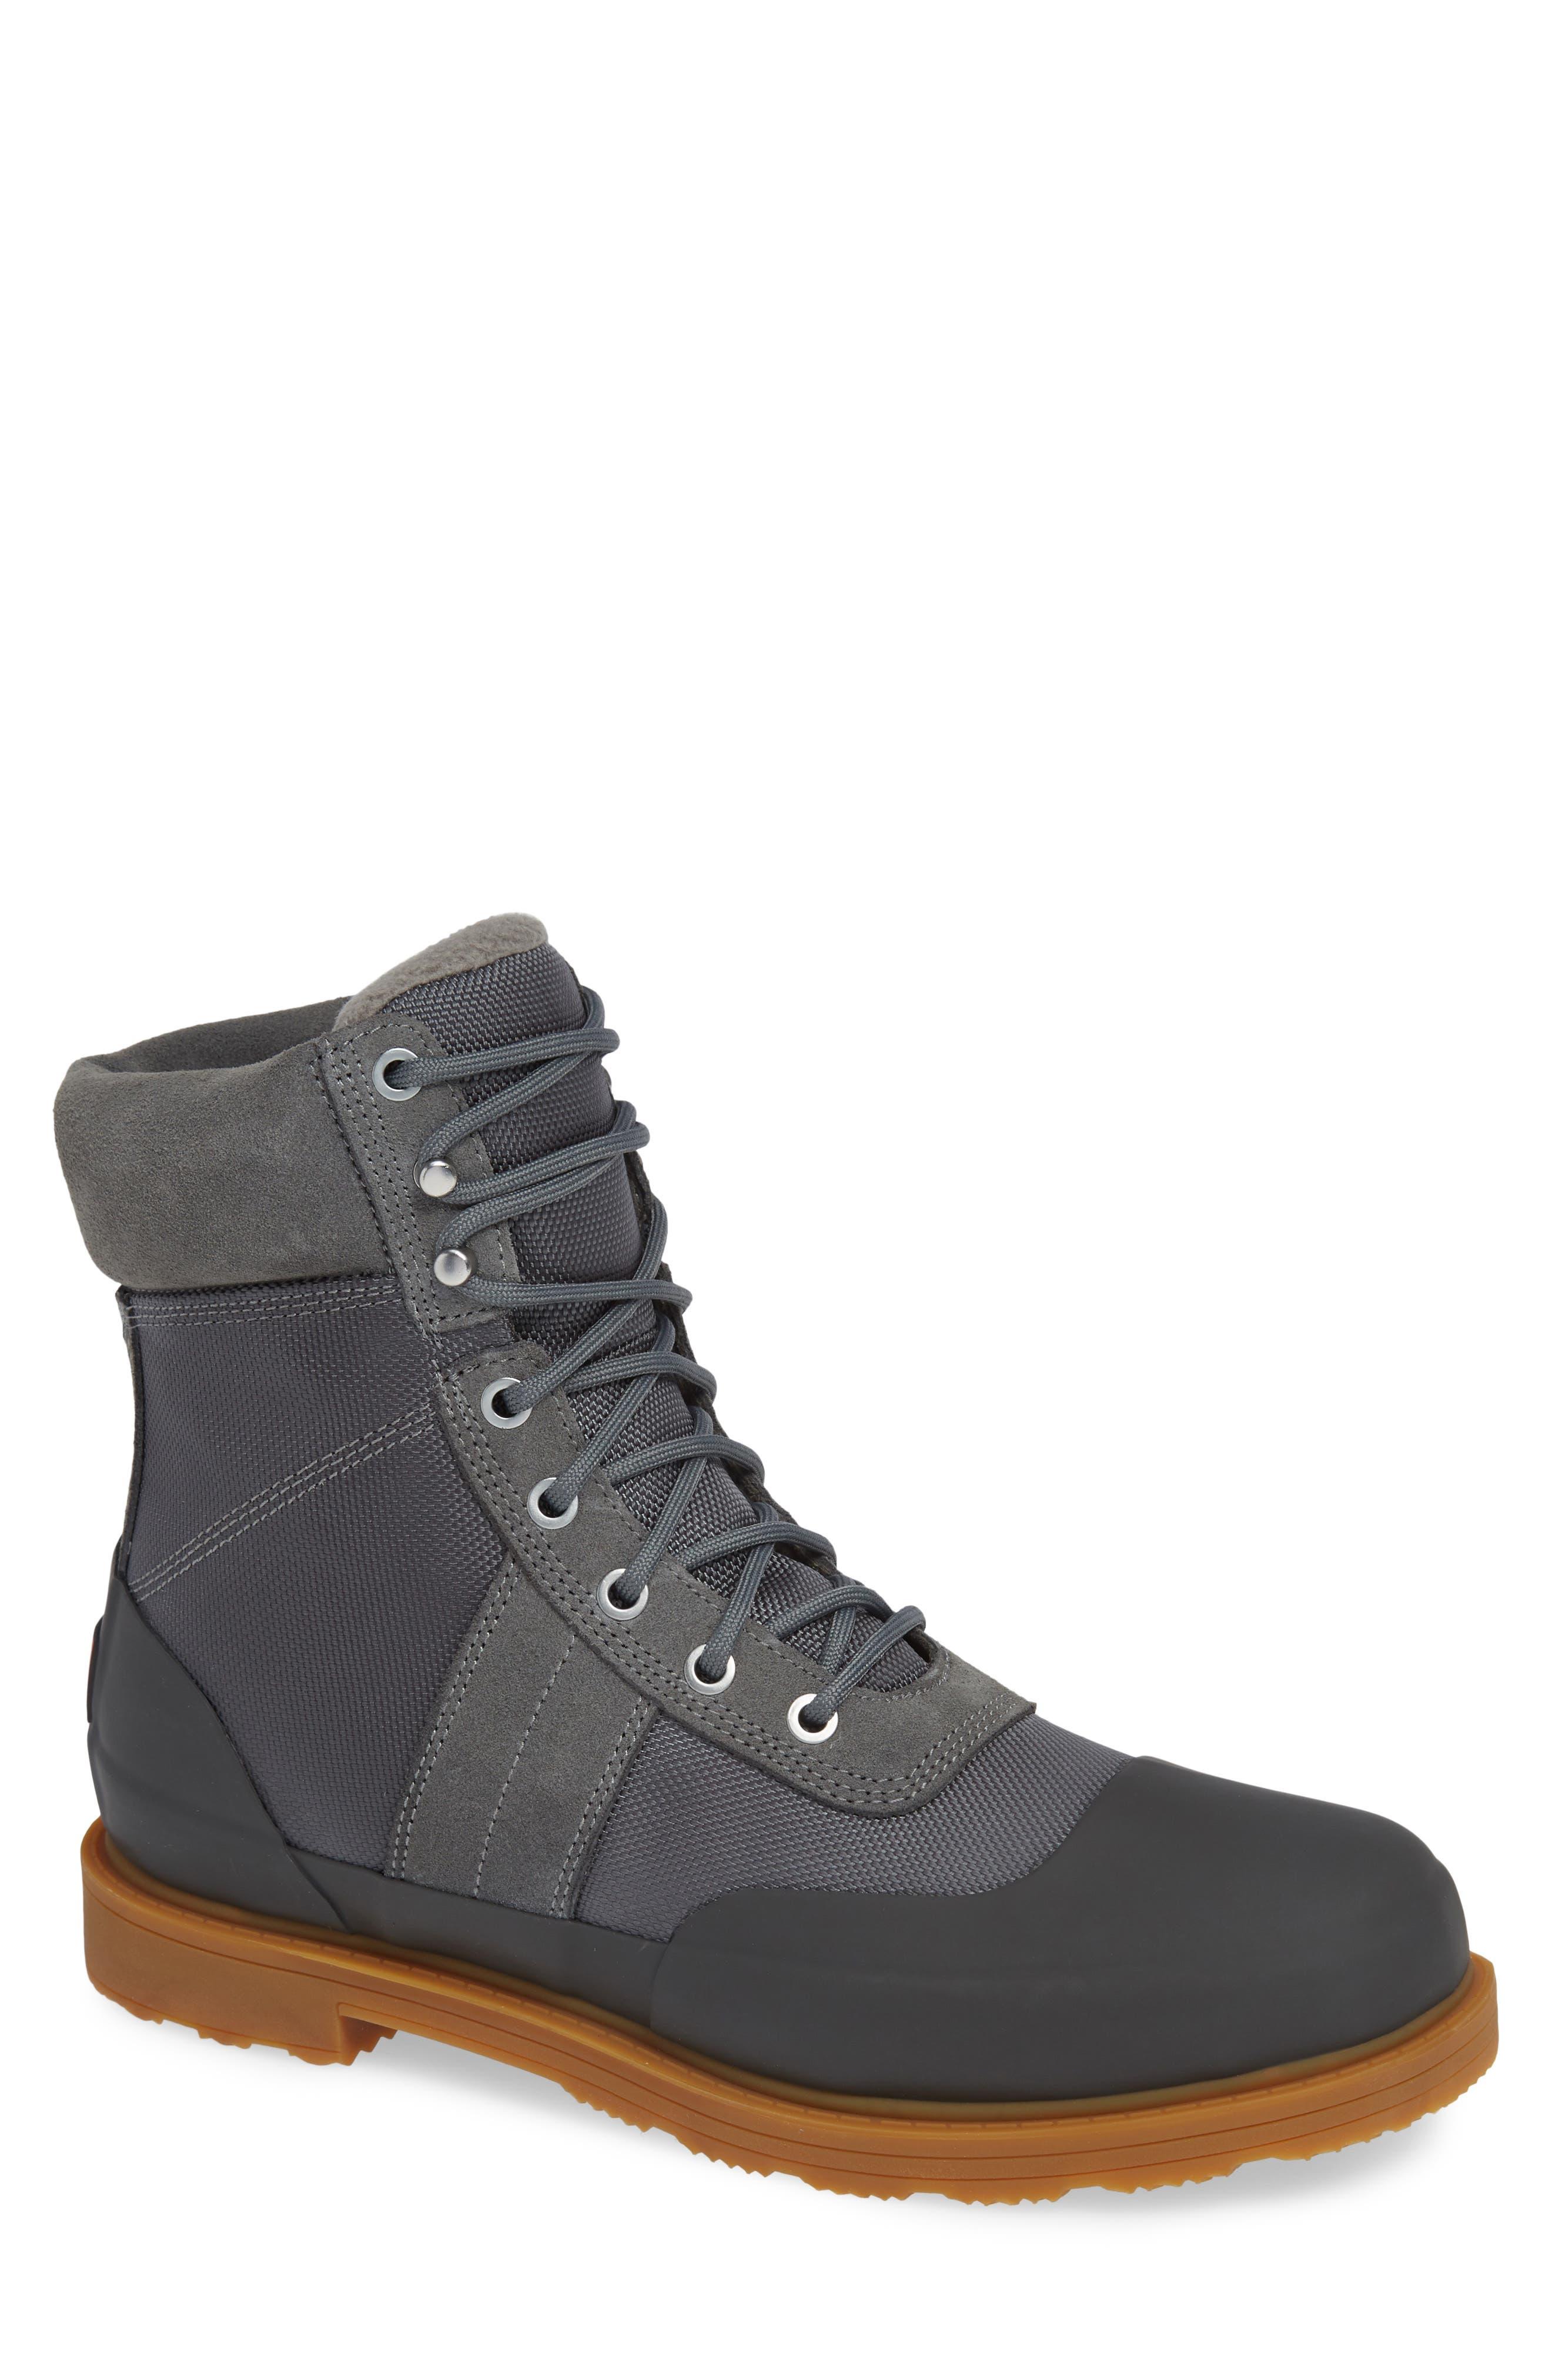 Hunter Original Insulated Commando Boot, Grey